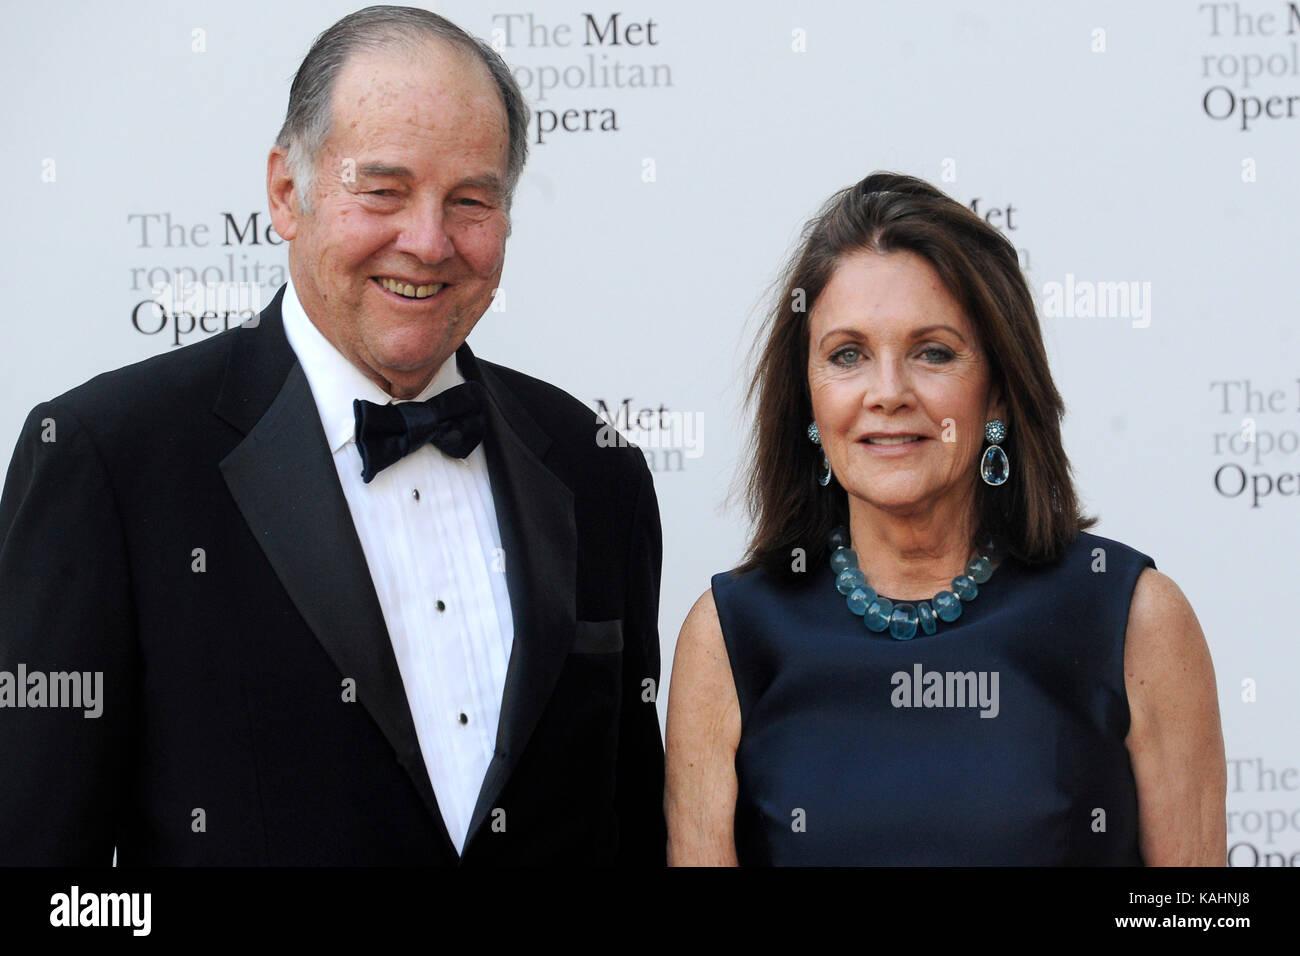 Thomas Kean and Susan Braddock attend the 2017 Metropolitan Opera Opening Night at The Metropolitan Opera House - Stock Image